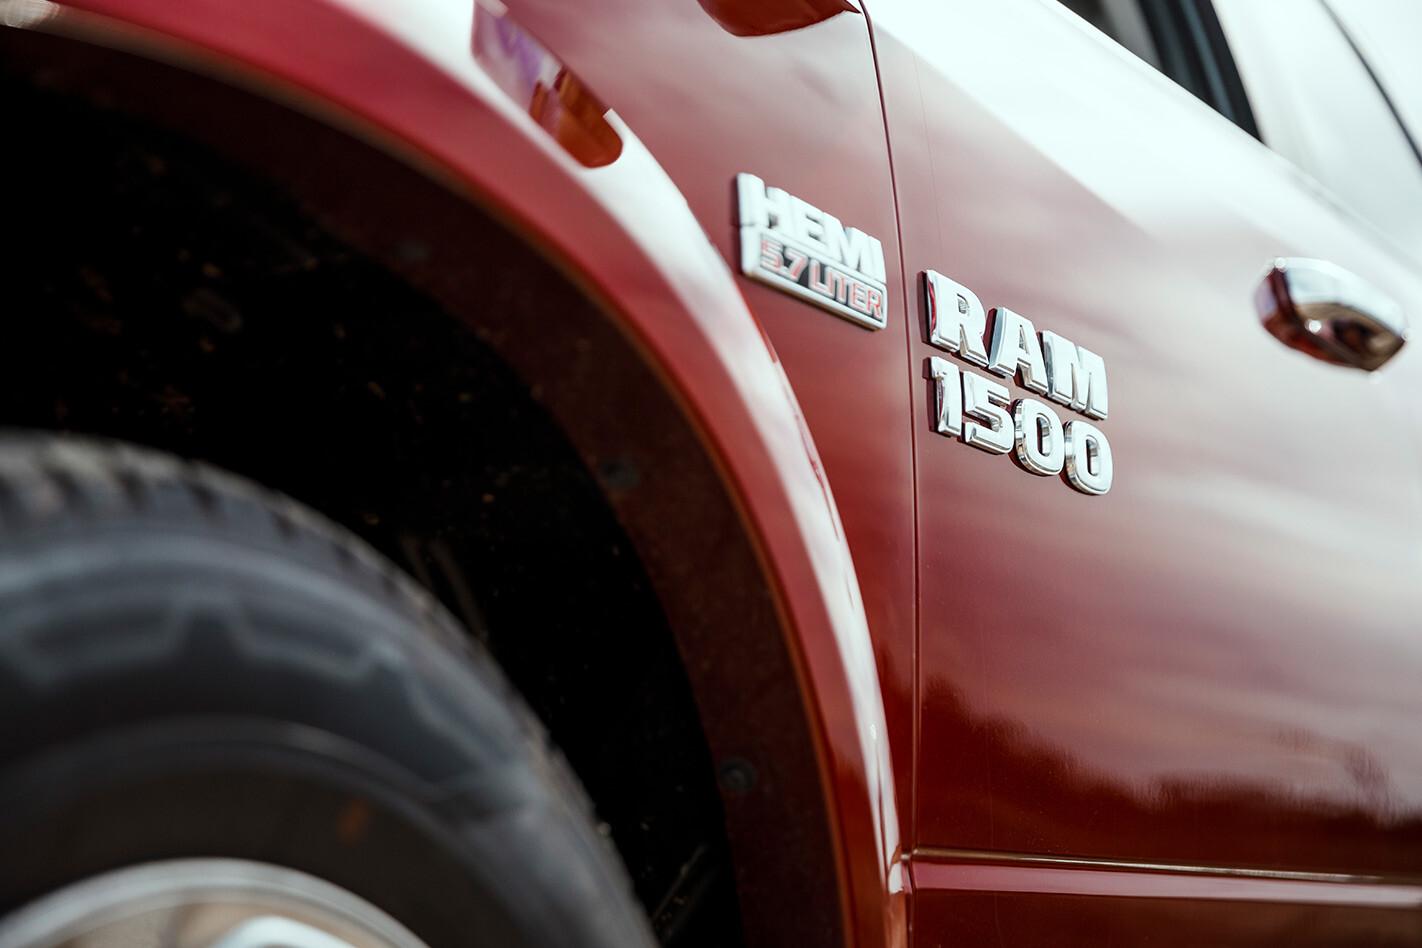 RAM 1500 badge